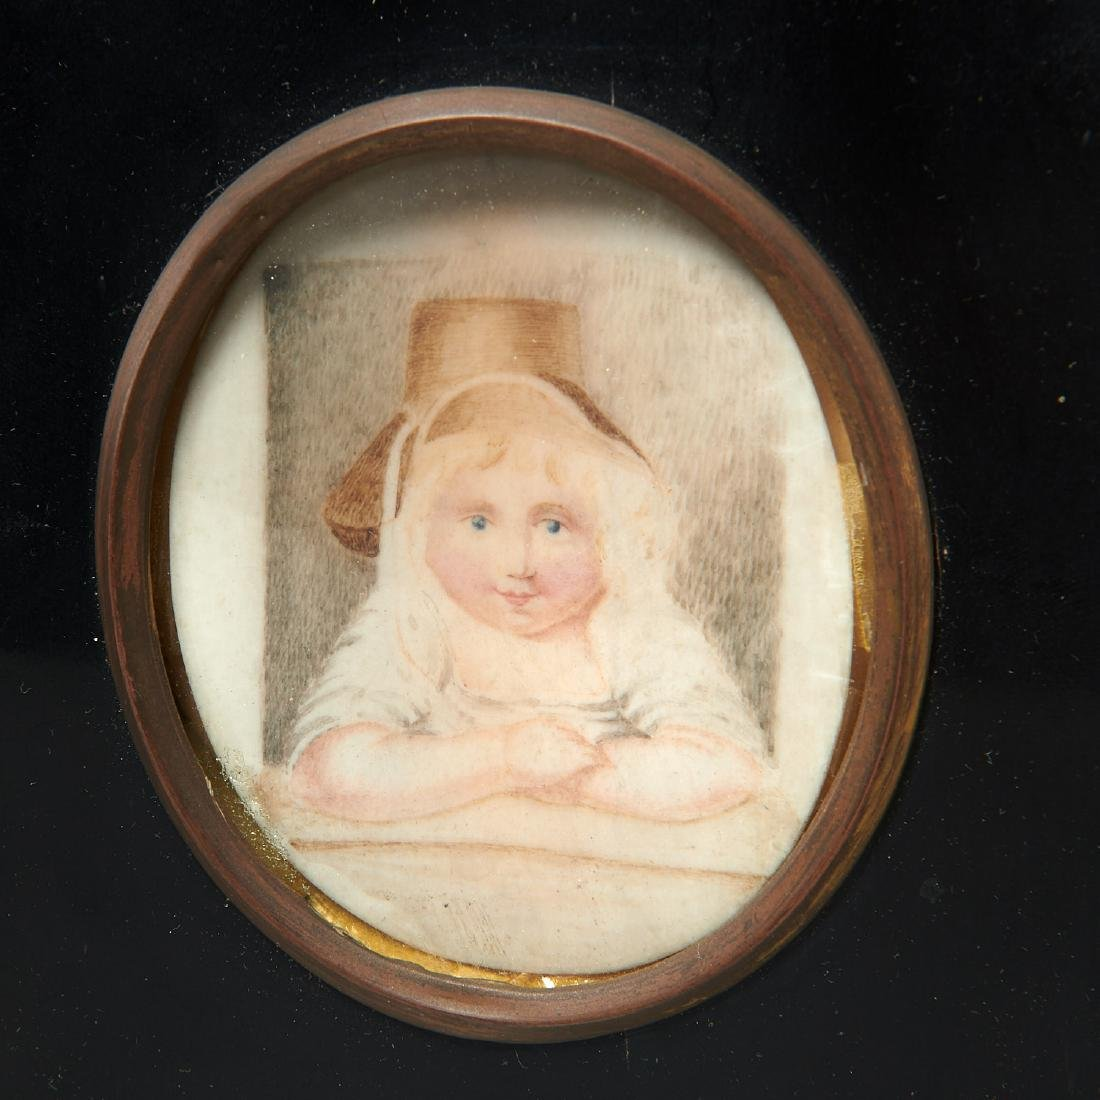 (2) child portrait miniatures with animals - 3